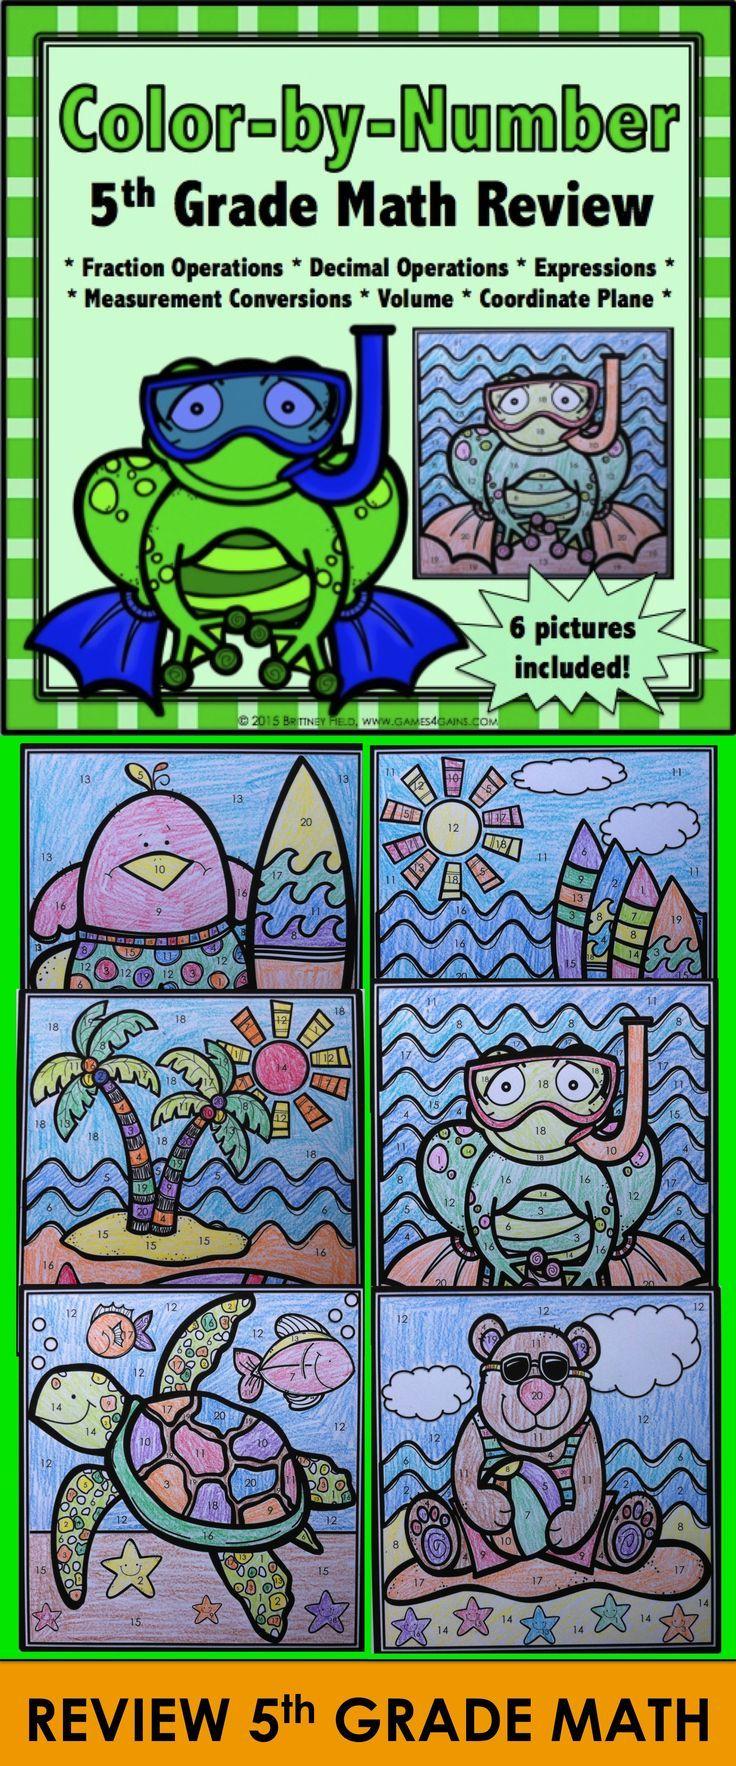 296 best Math Concepts images on Pinterest | Math concepts, High ...